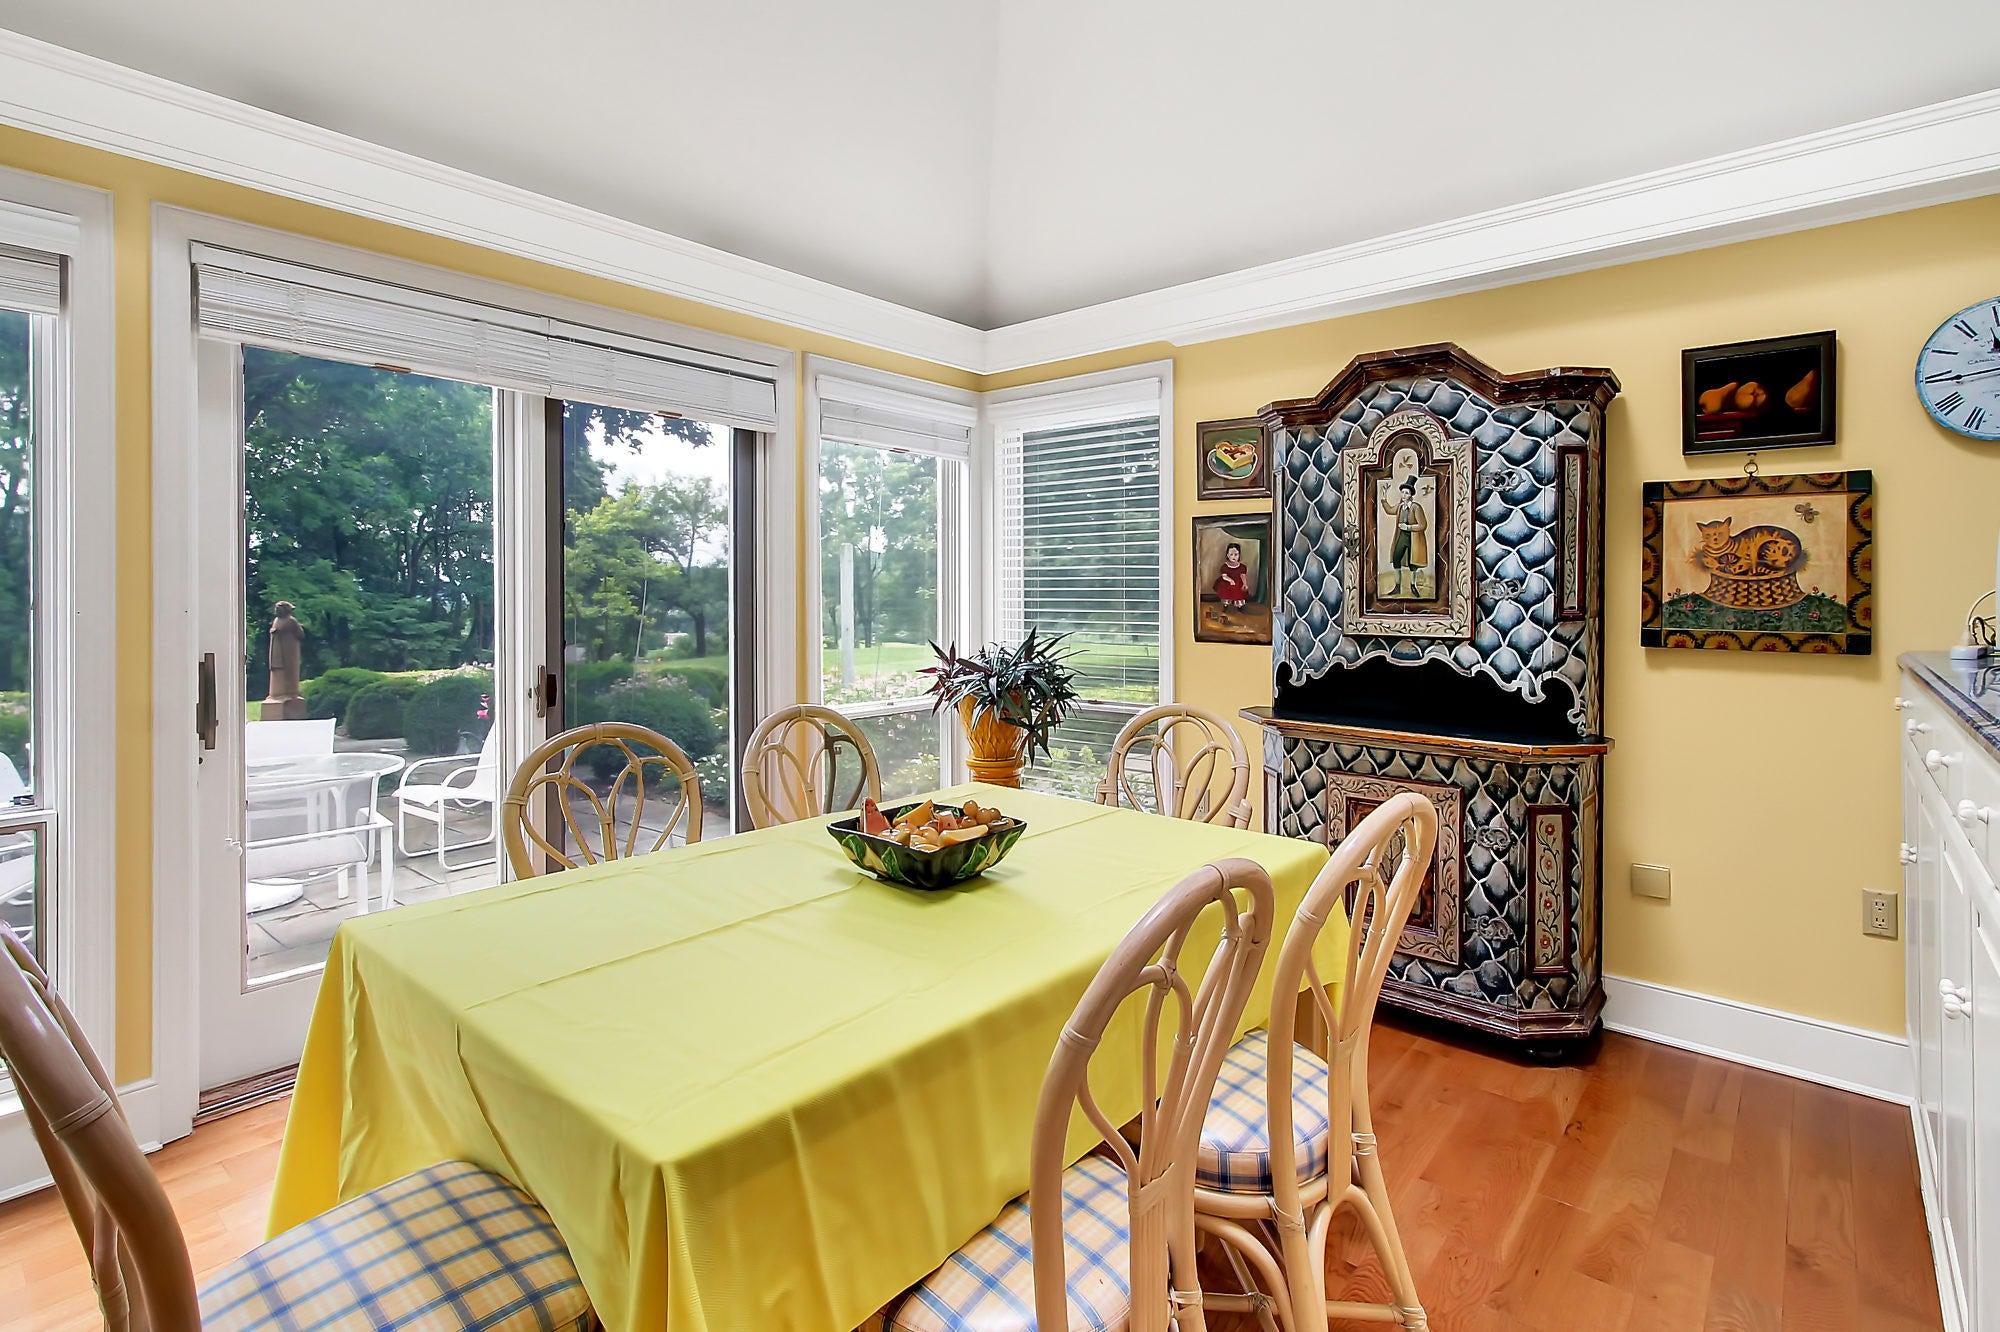 Additional photo for property listing at 70 DEVON DRIVE 70 DEVON DRIVE Reading, Pennsylvania 19606 Estados Unidos